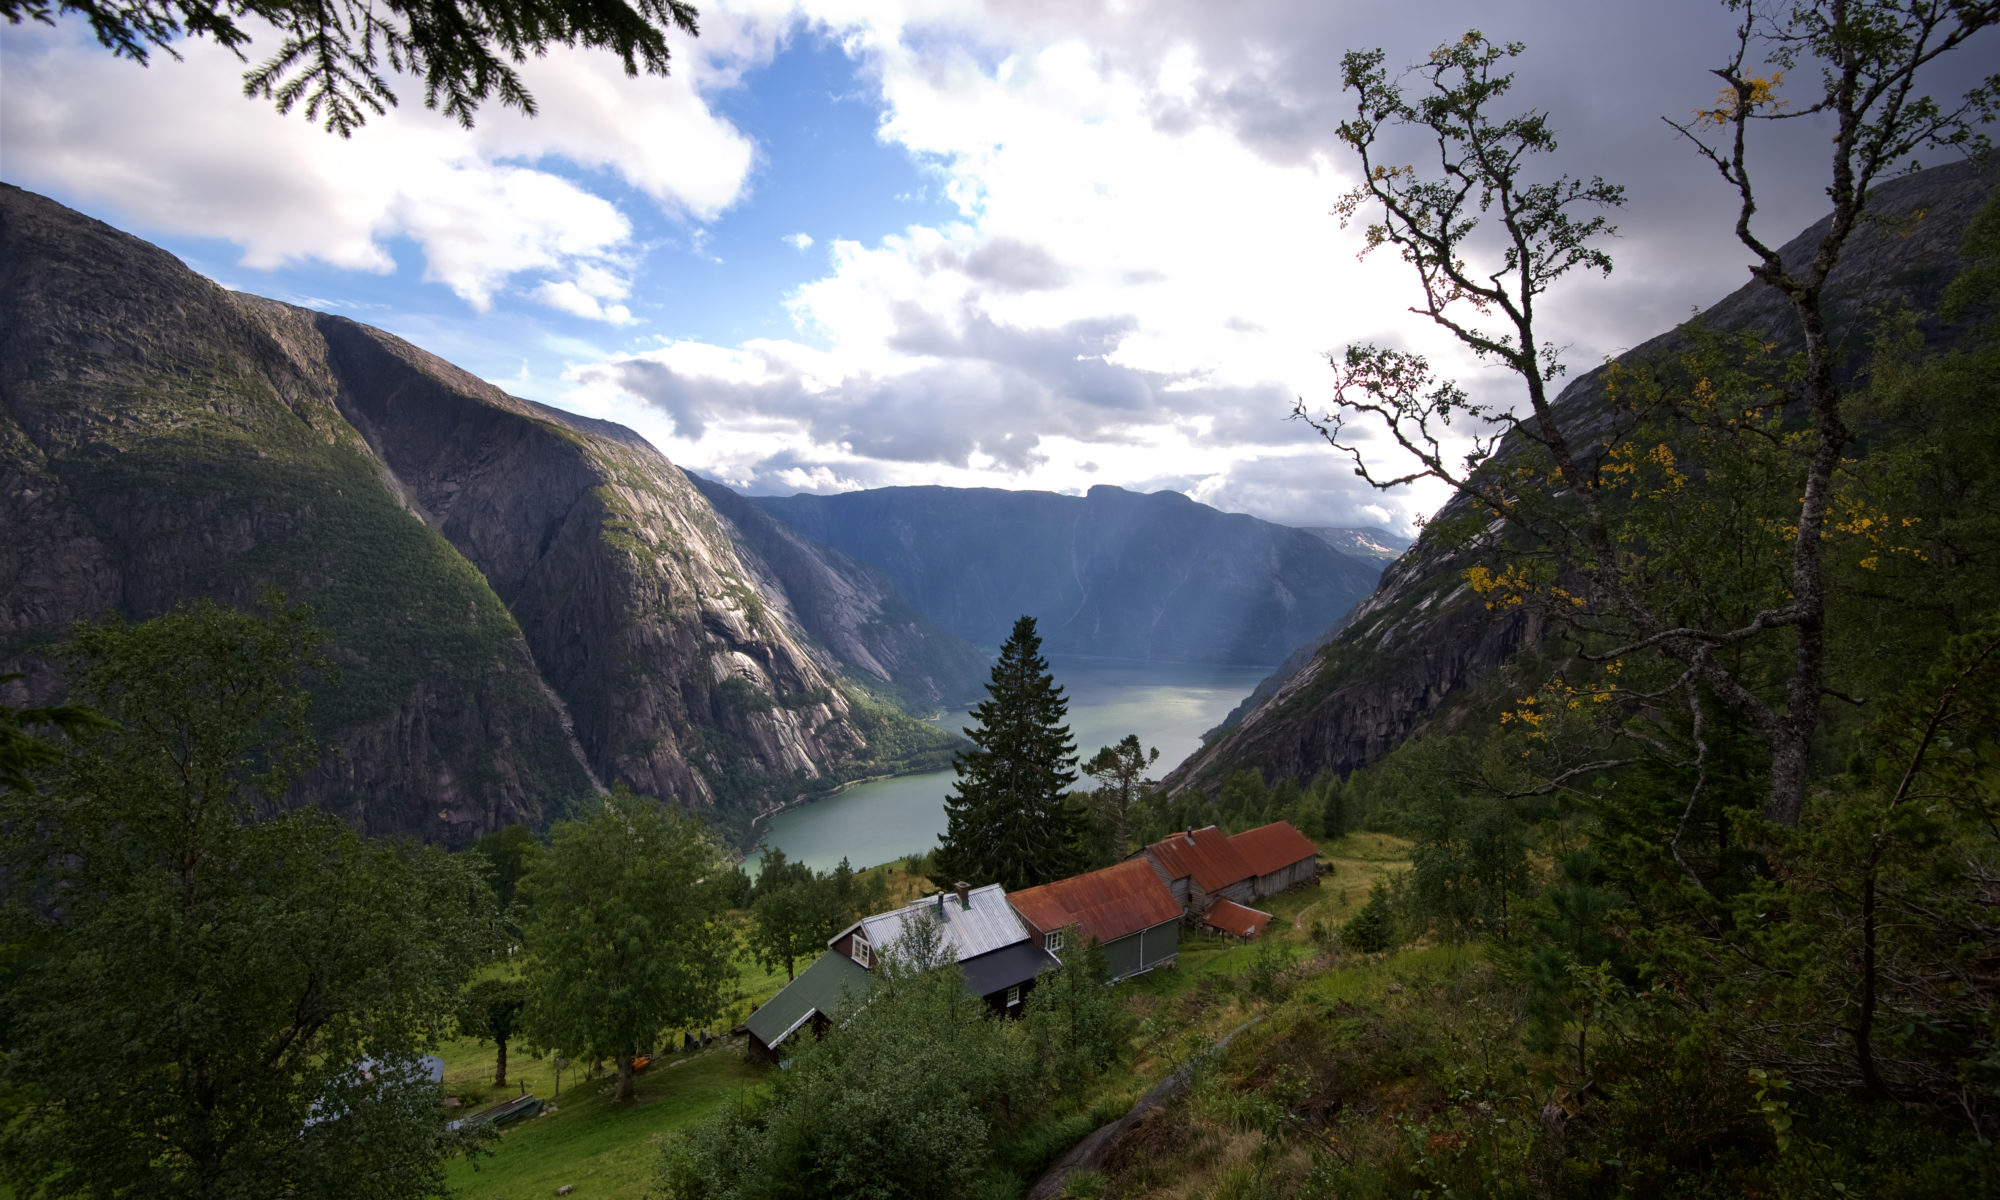 Kjeåsen in Eidfjord, Hardanger